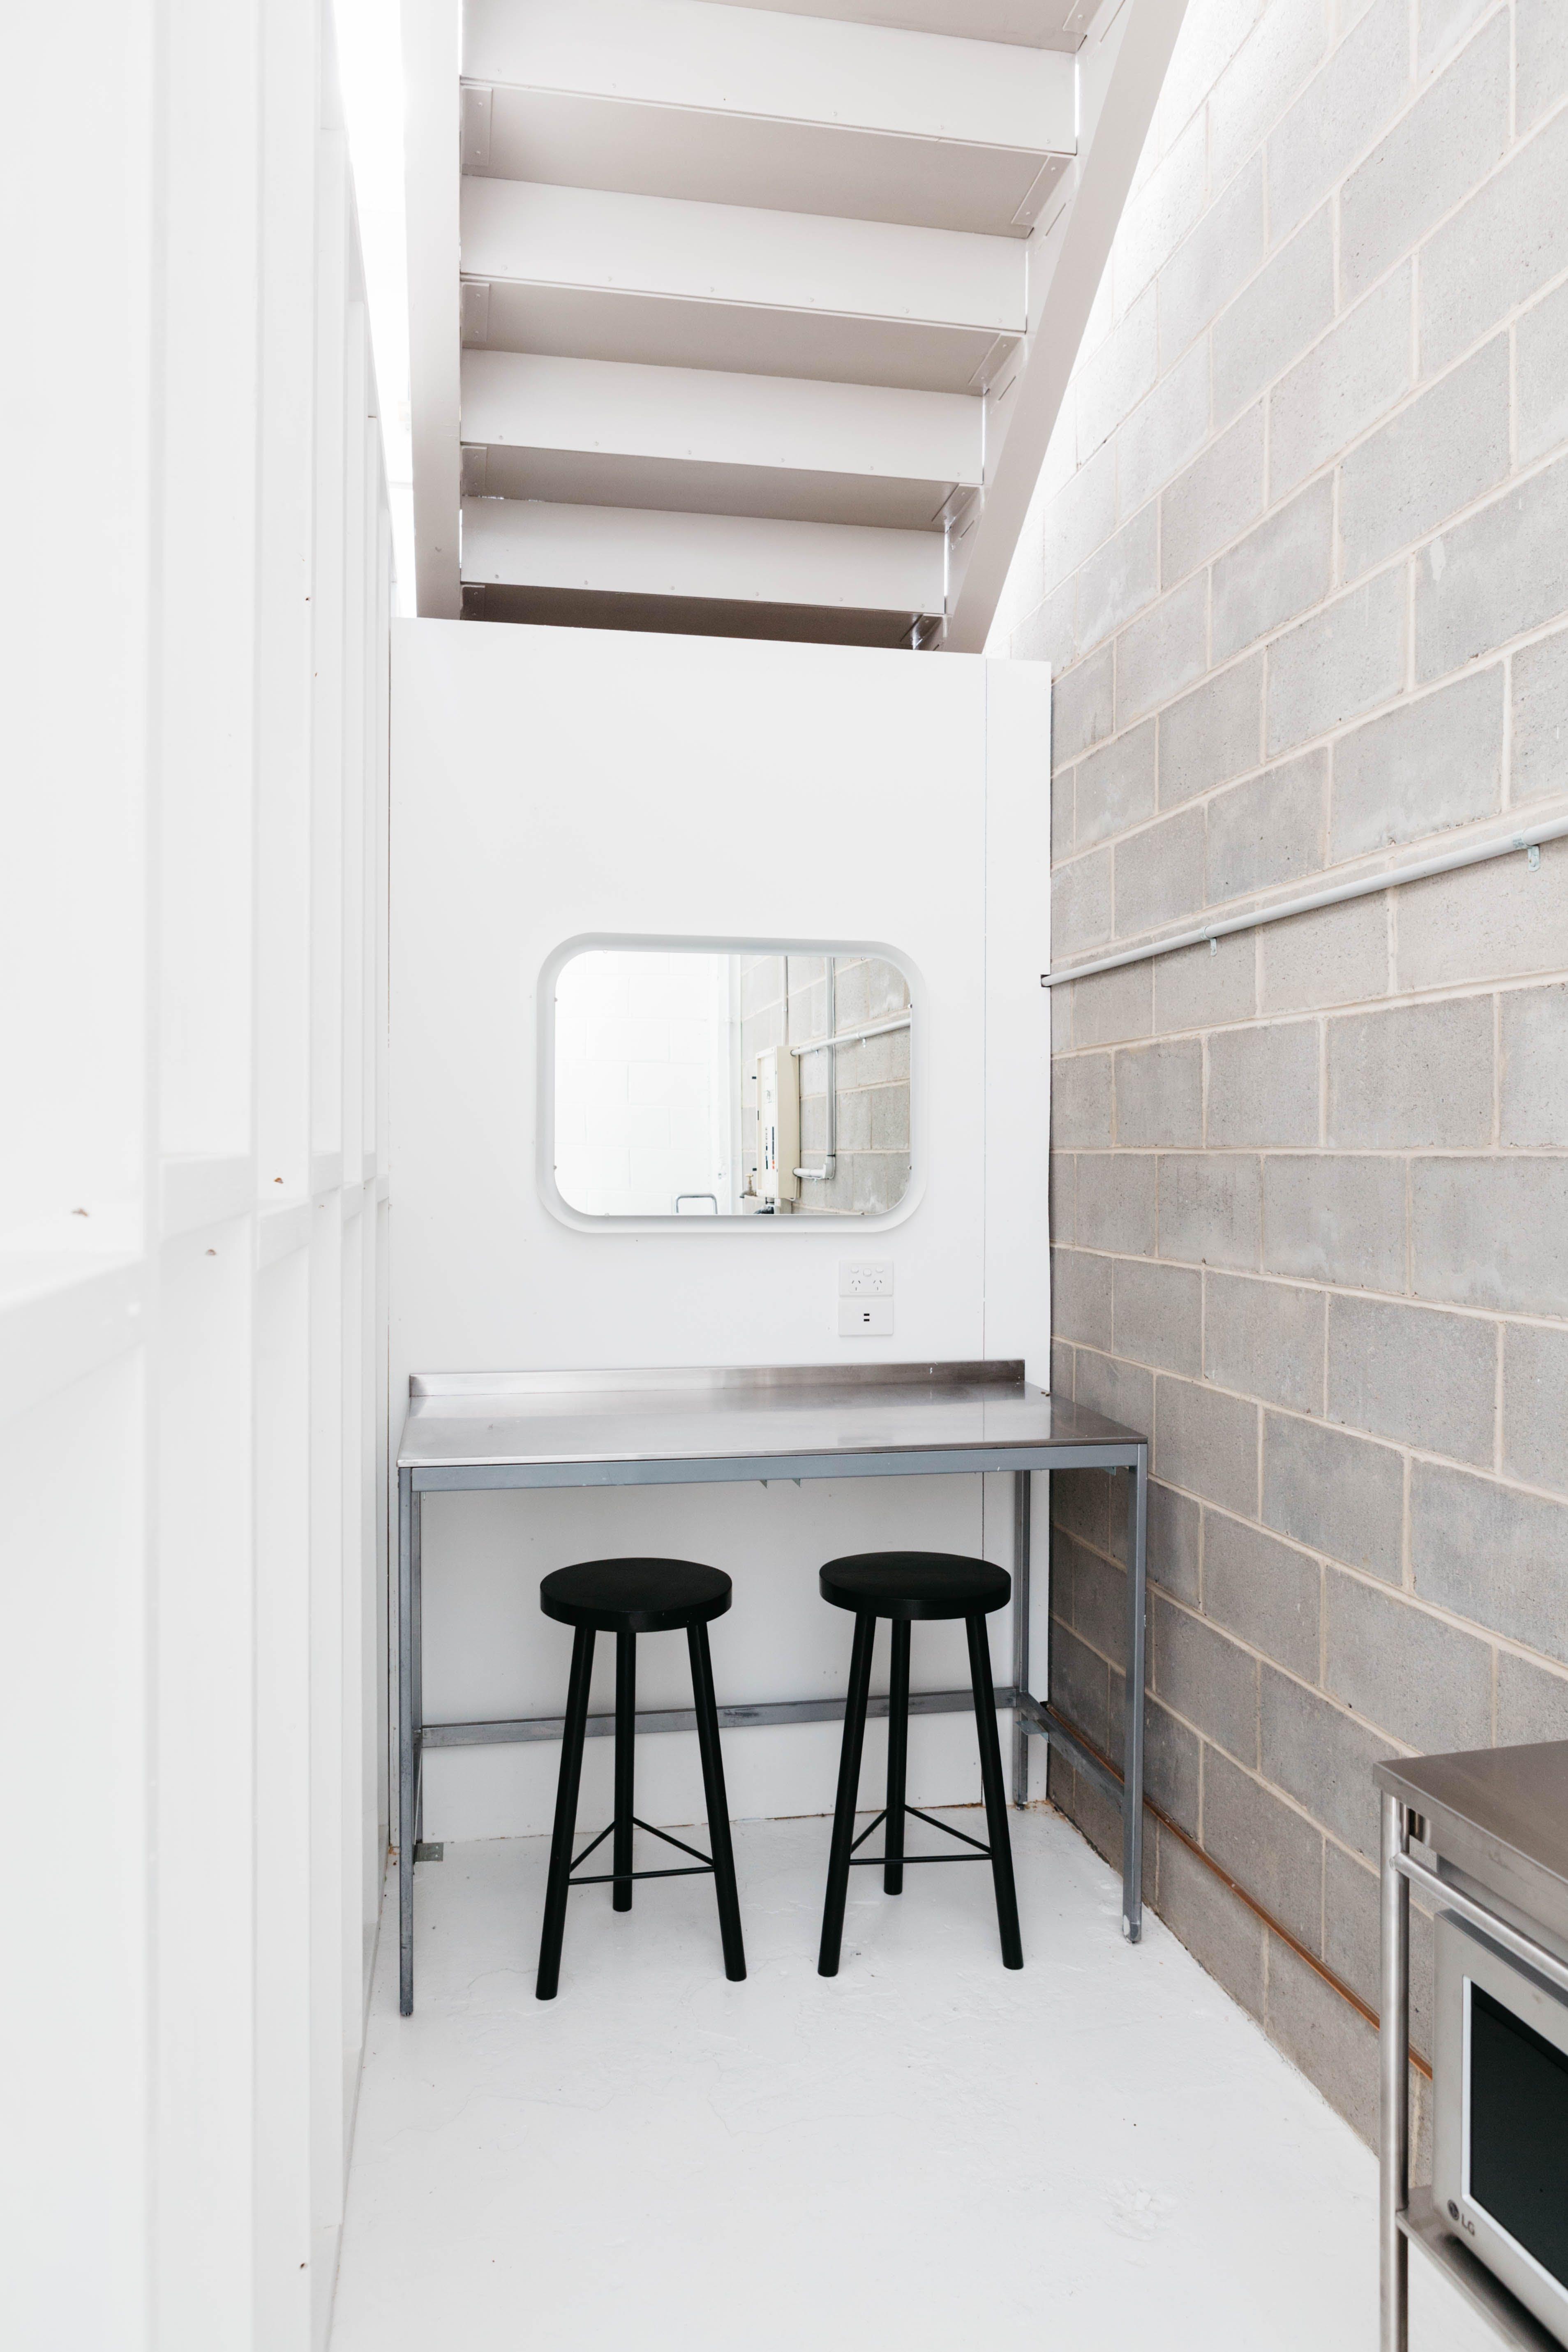 Downstairs Studio, creative studio at StudioLocal, image 3